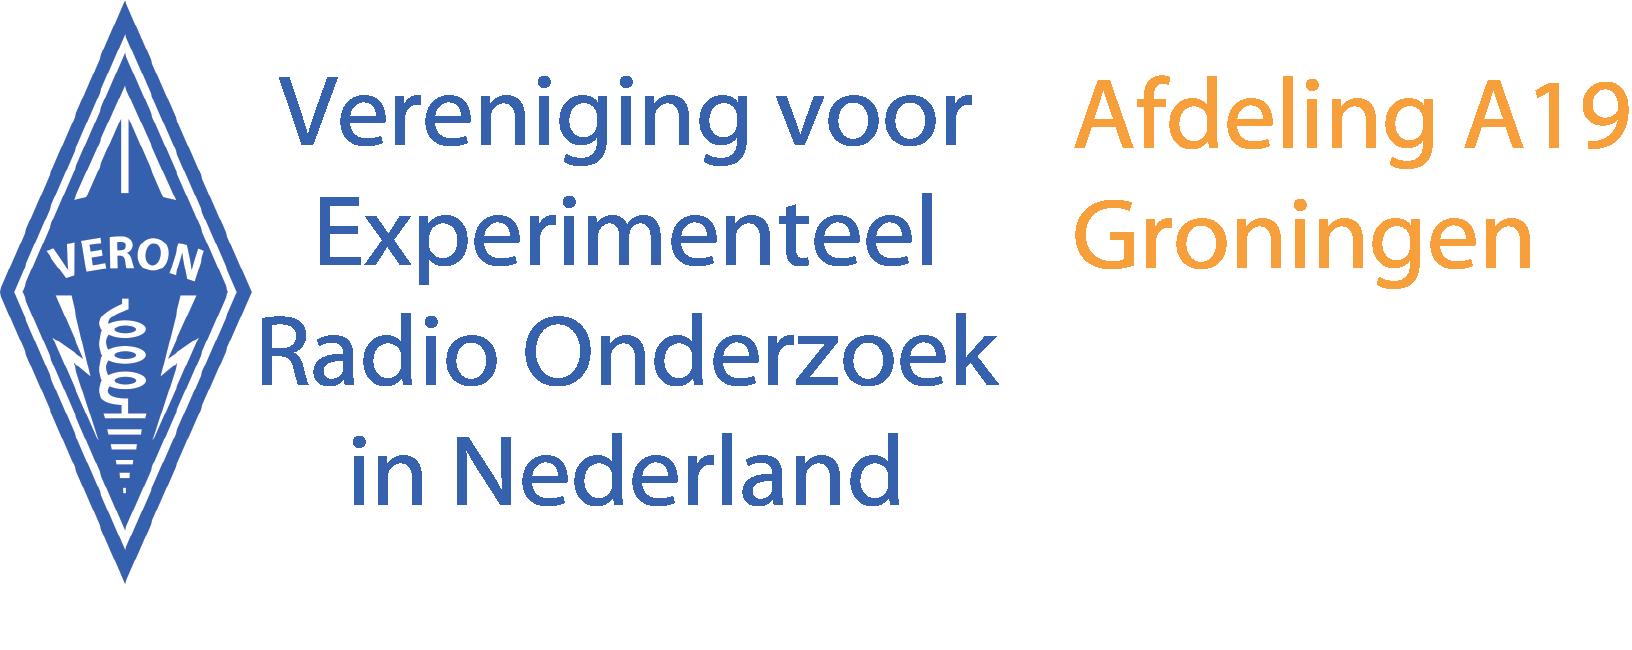 VERON a19 - Groningen